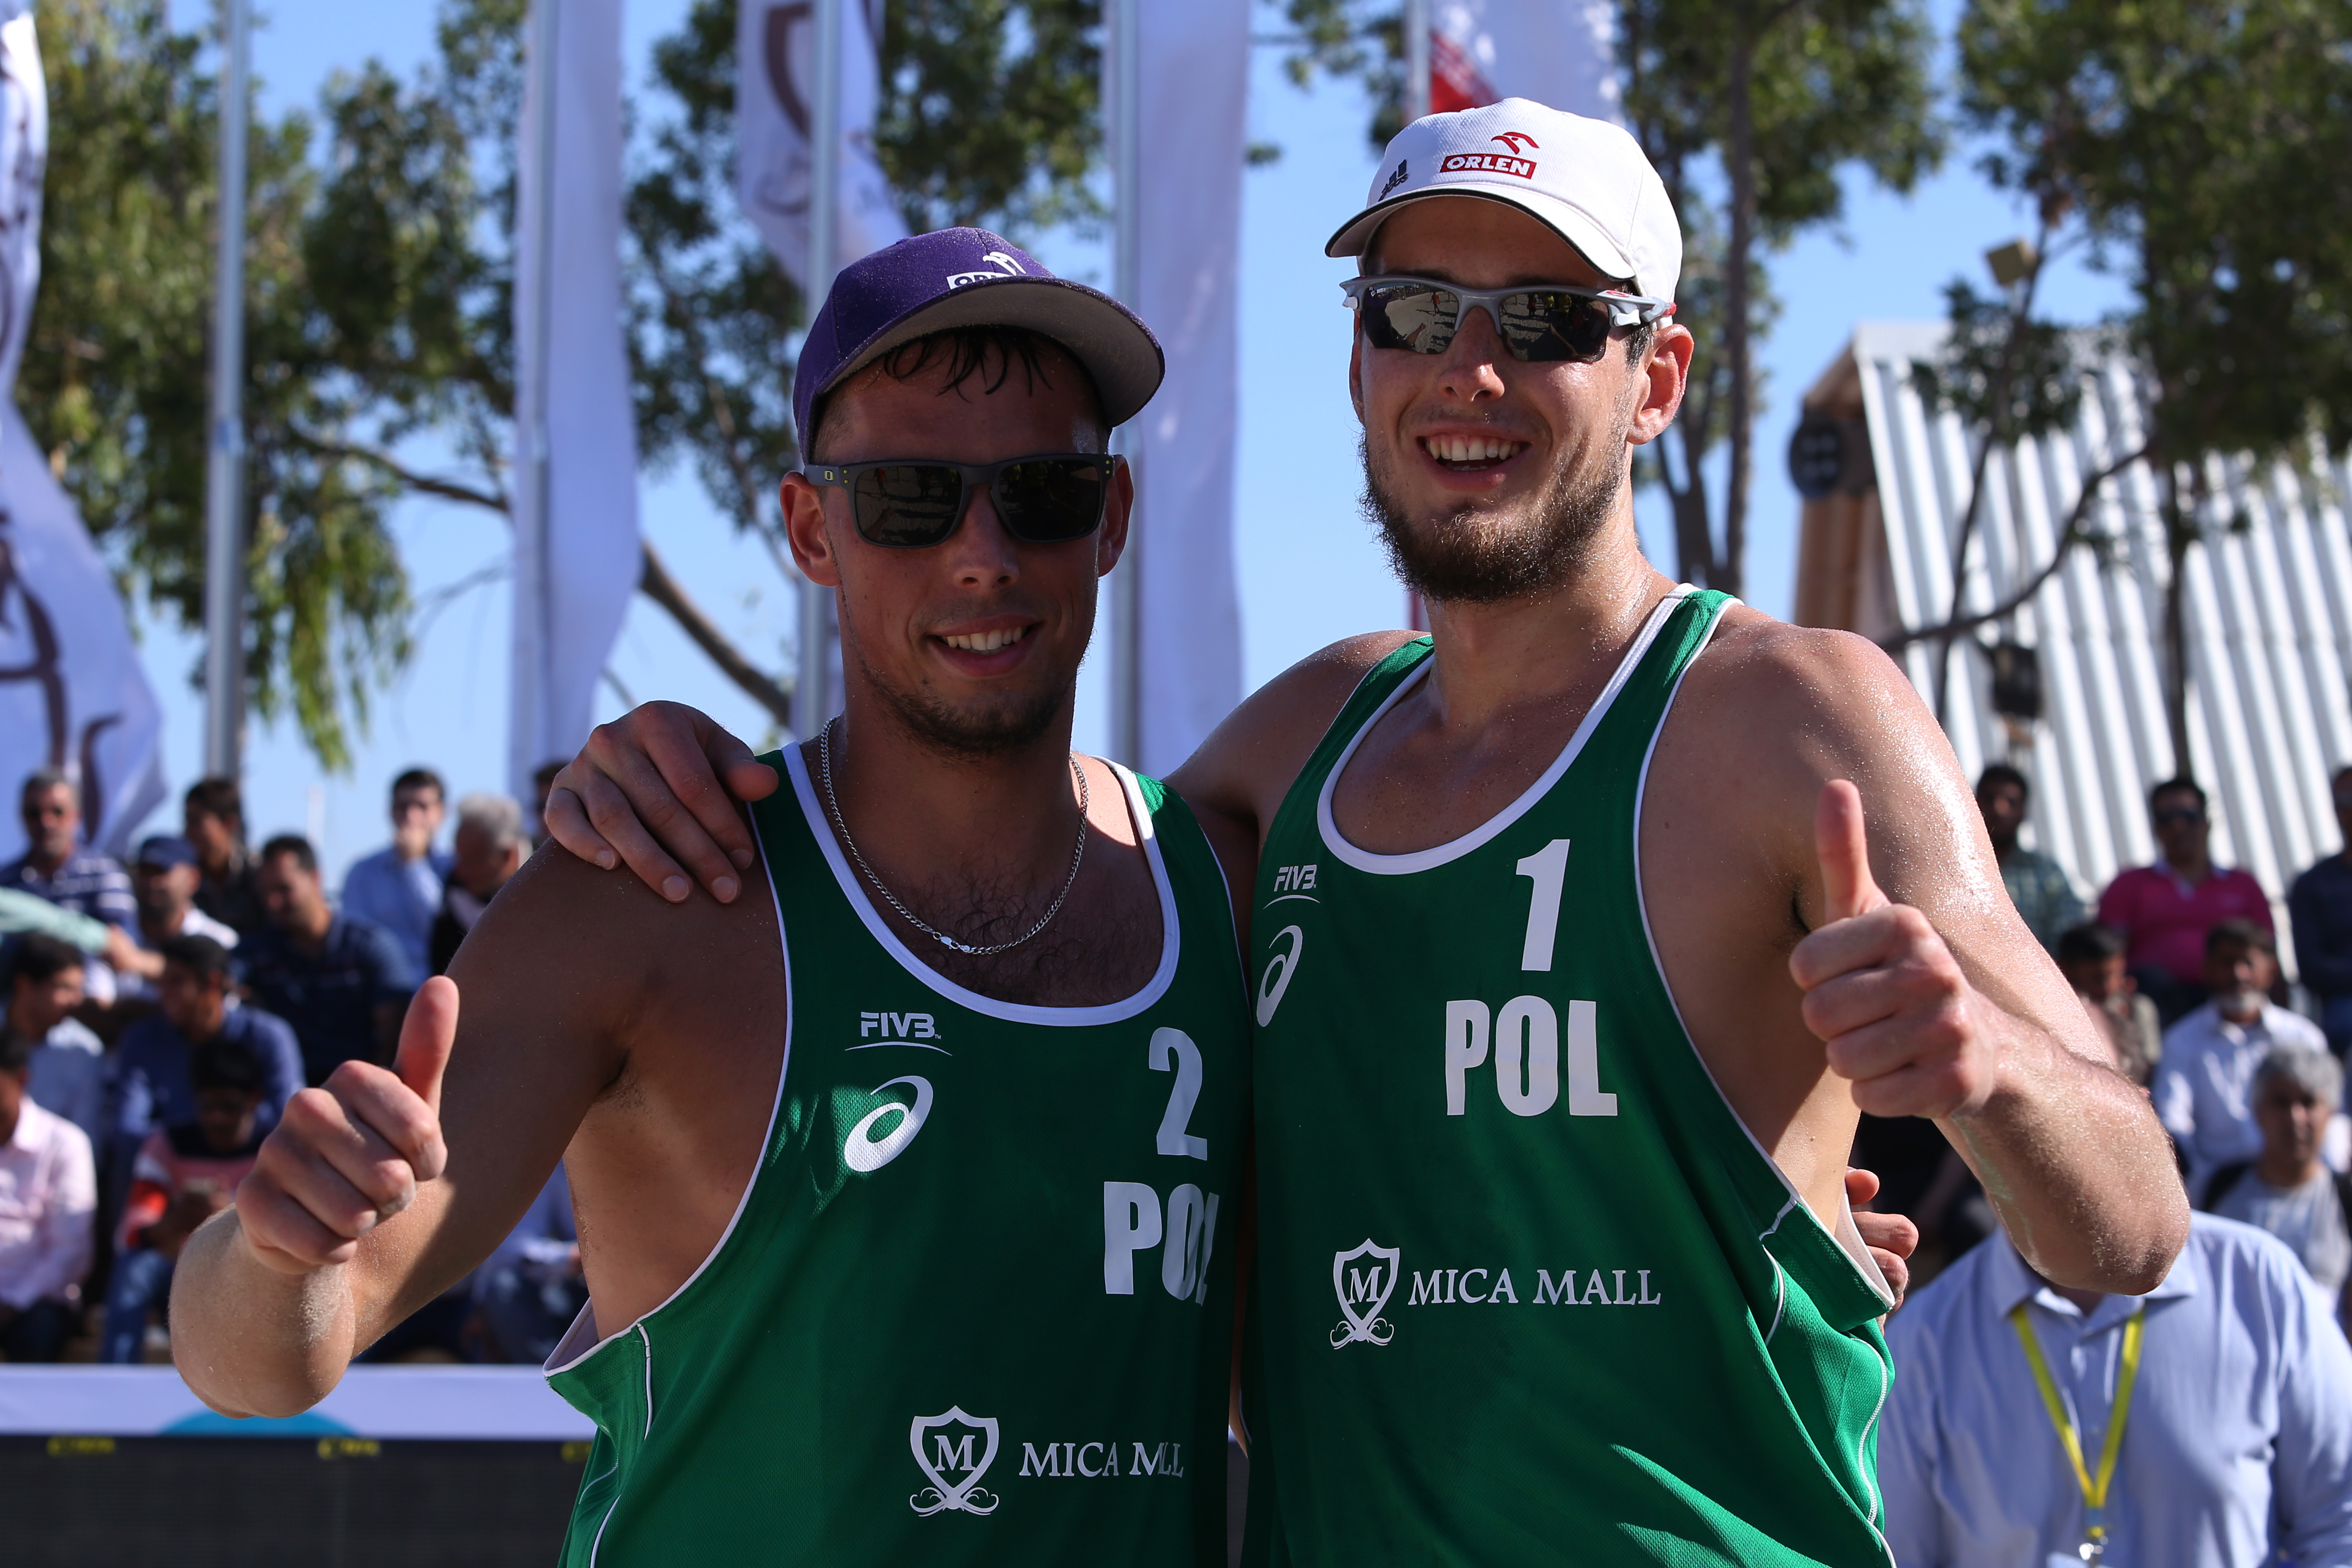 Olympians at Kish Island Open